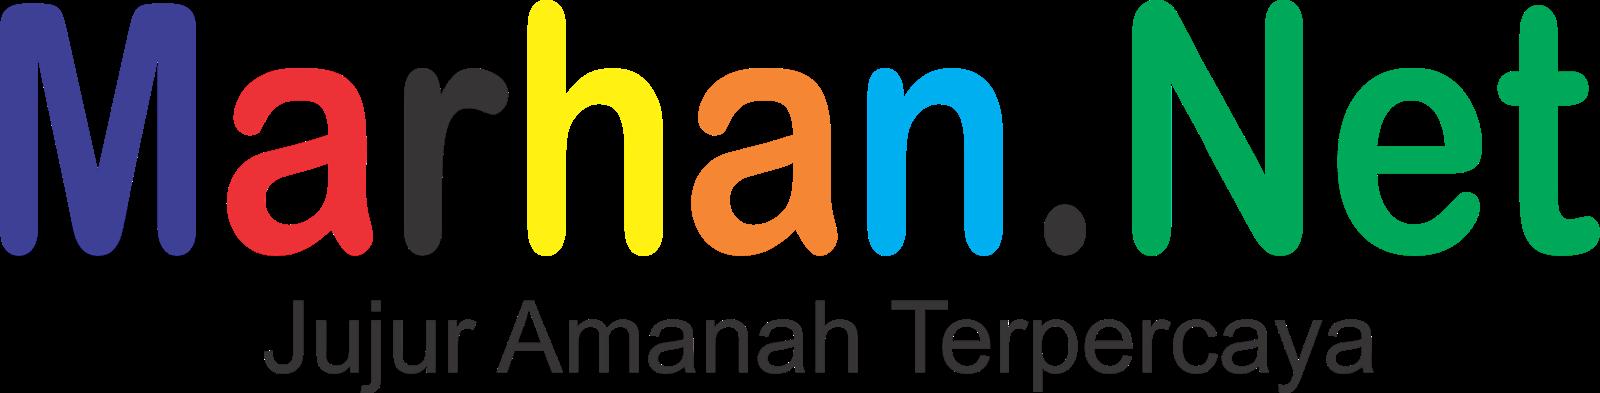 MARHAN.NET